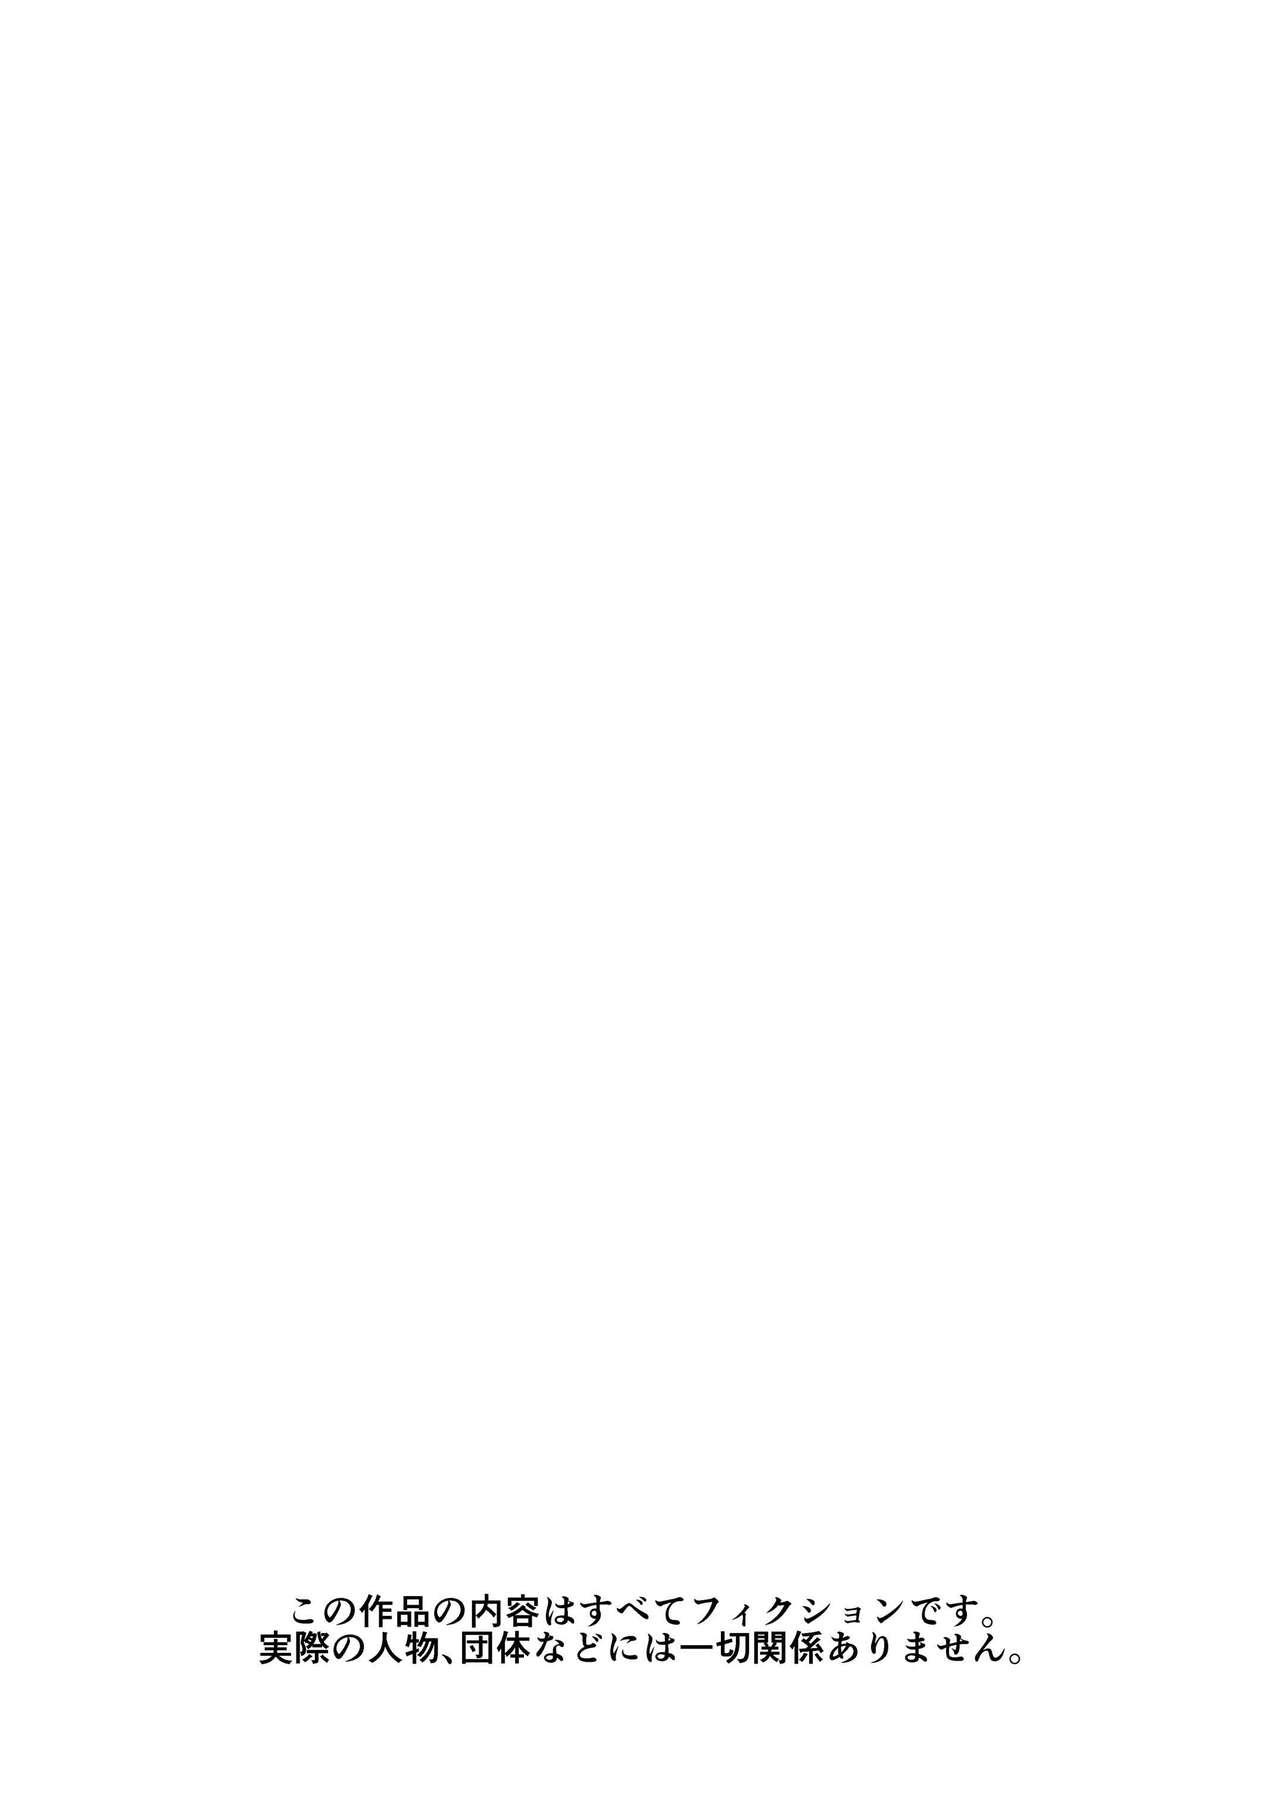 [CorkBOX (ngng)] Ise-kun wa Tamatte Iru. - Ise-kun is horny. [Chinese] {日曜日汉化} [Digital] 29